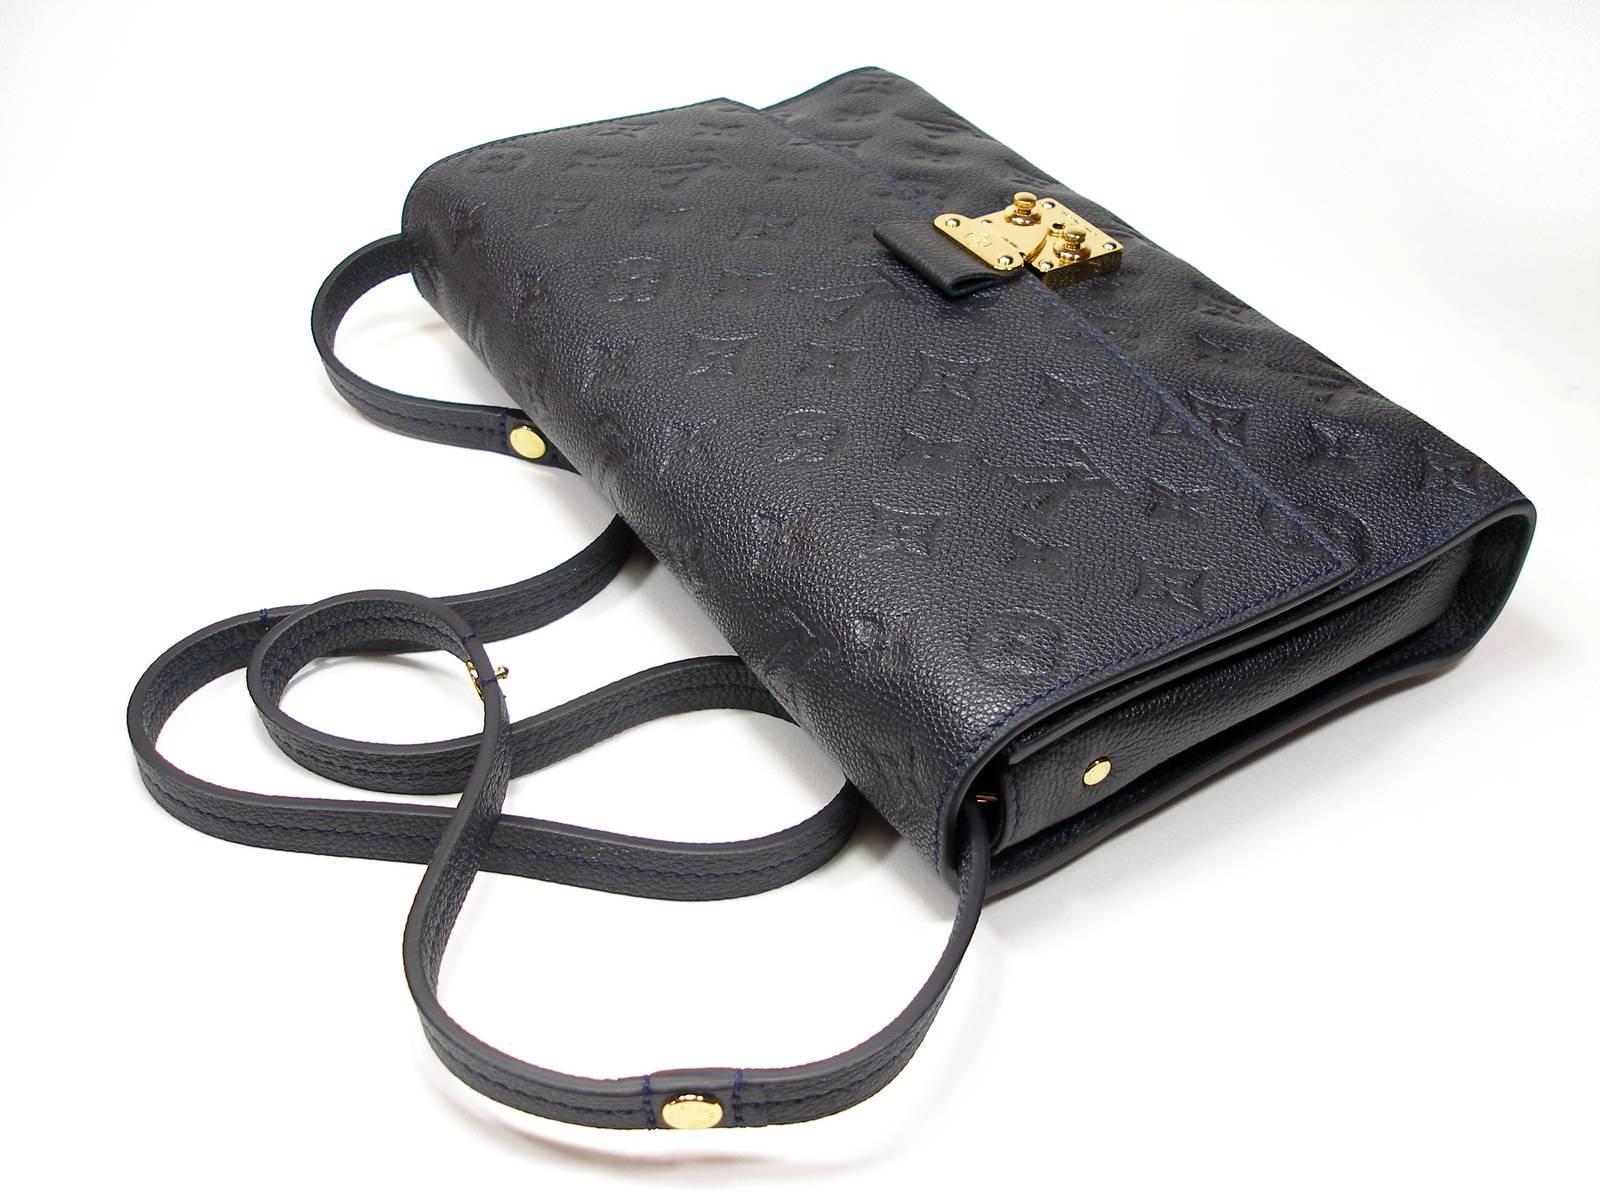 0be6cd182e64 Louis Vuitton Monogram Empreinte Fascinante Blue Dark Shoulder Bag at  1stdibs